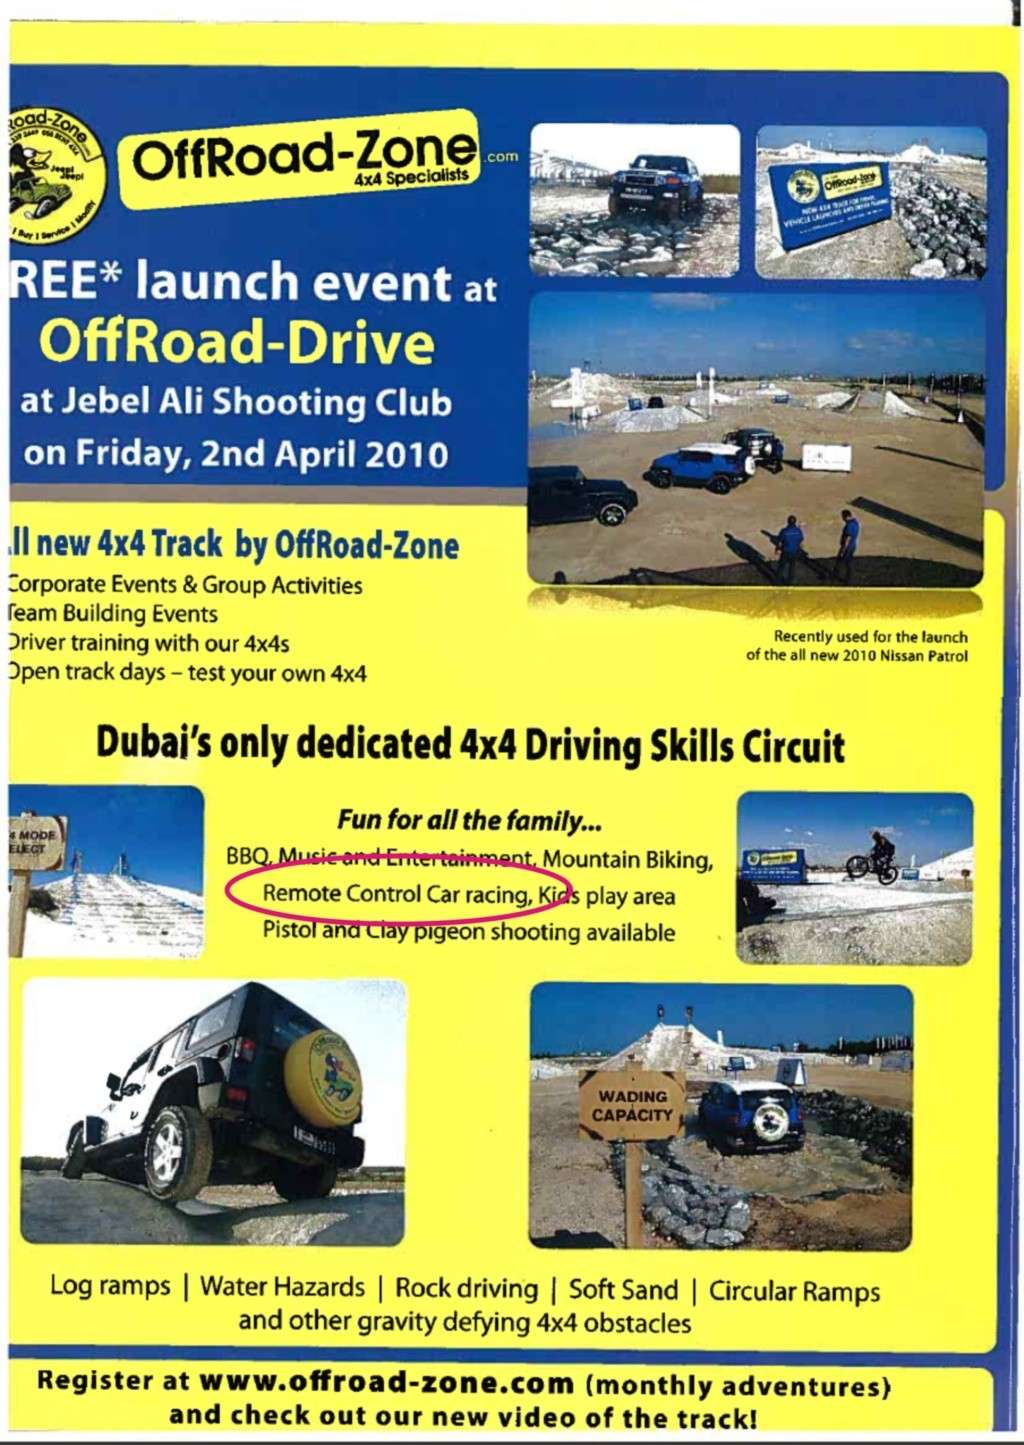 Offroad RC racing at Jebel Ali Shooting Club? Oz11